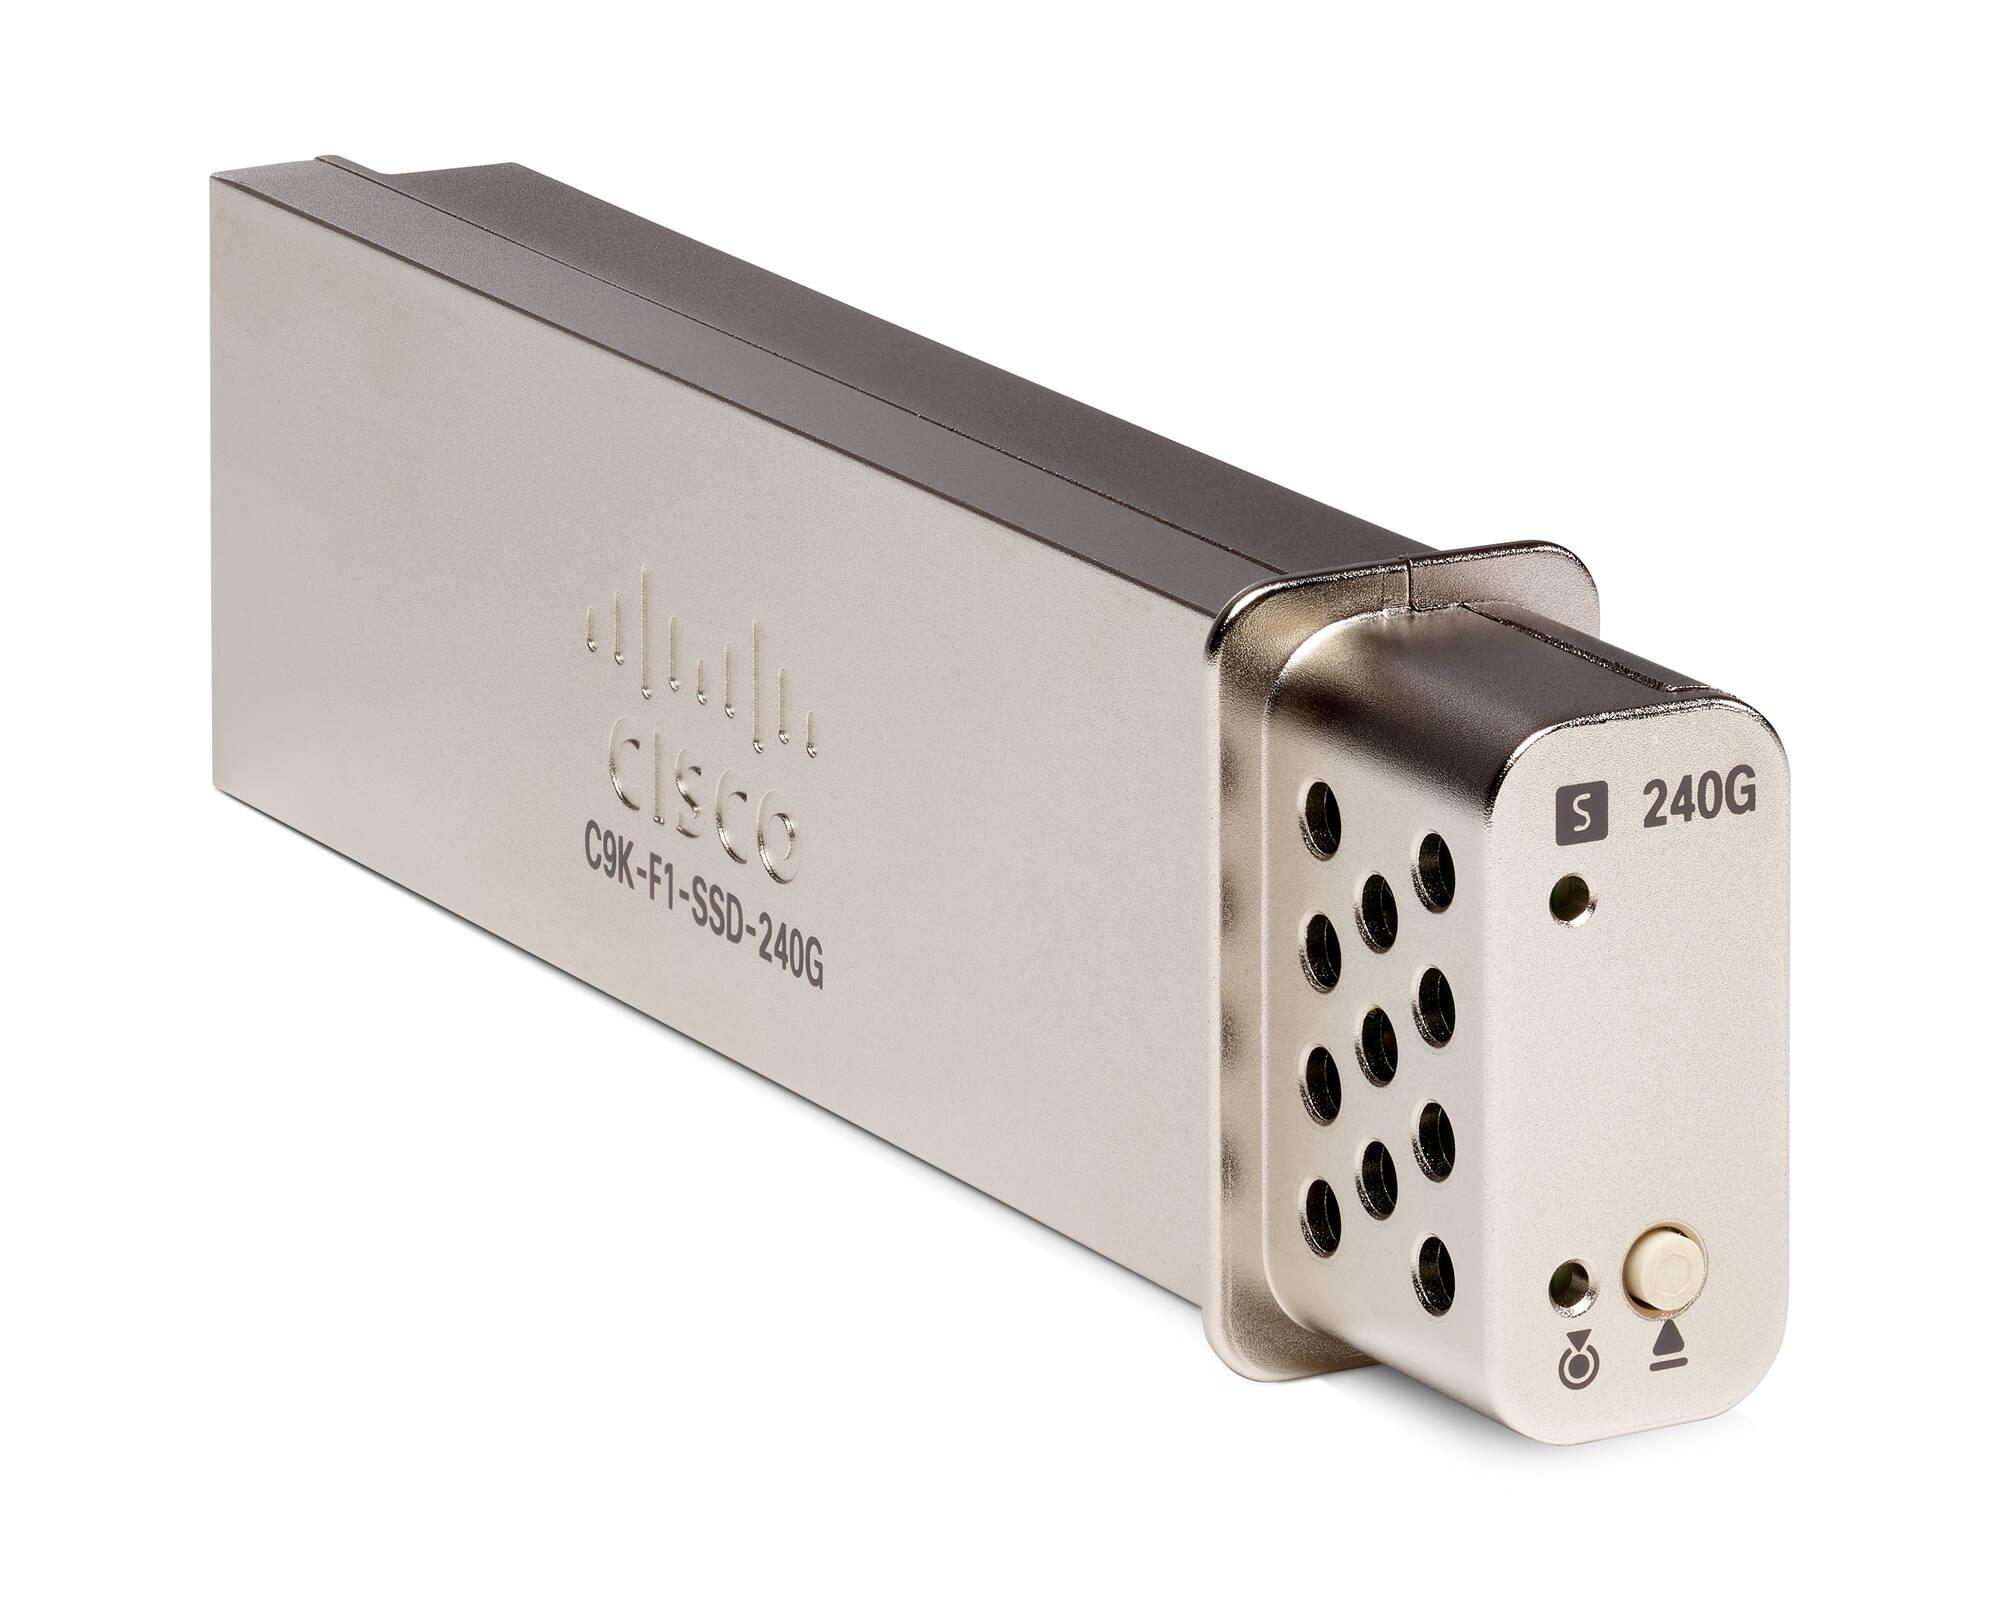 C9K-F2-SSD-480GB (=)   Cisco Catalyst 9600 Series 480GB SSD Storage 思科9600系列交换机用 480Gb固态硬盘